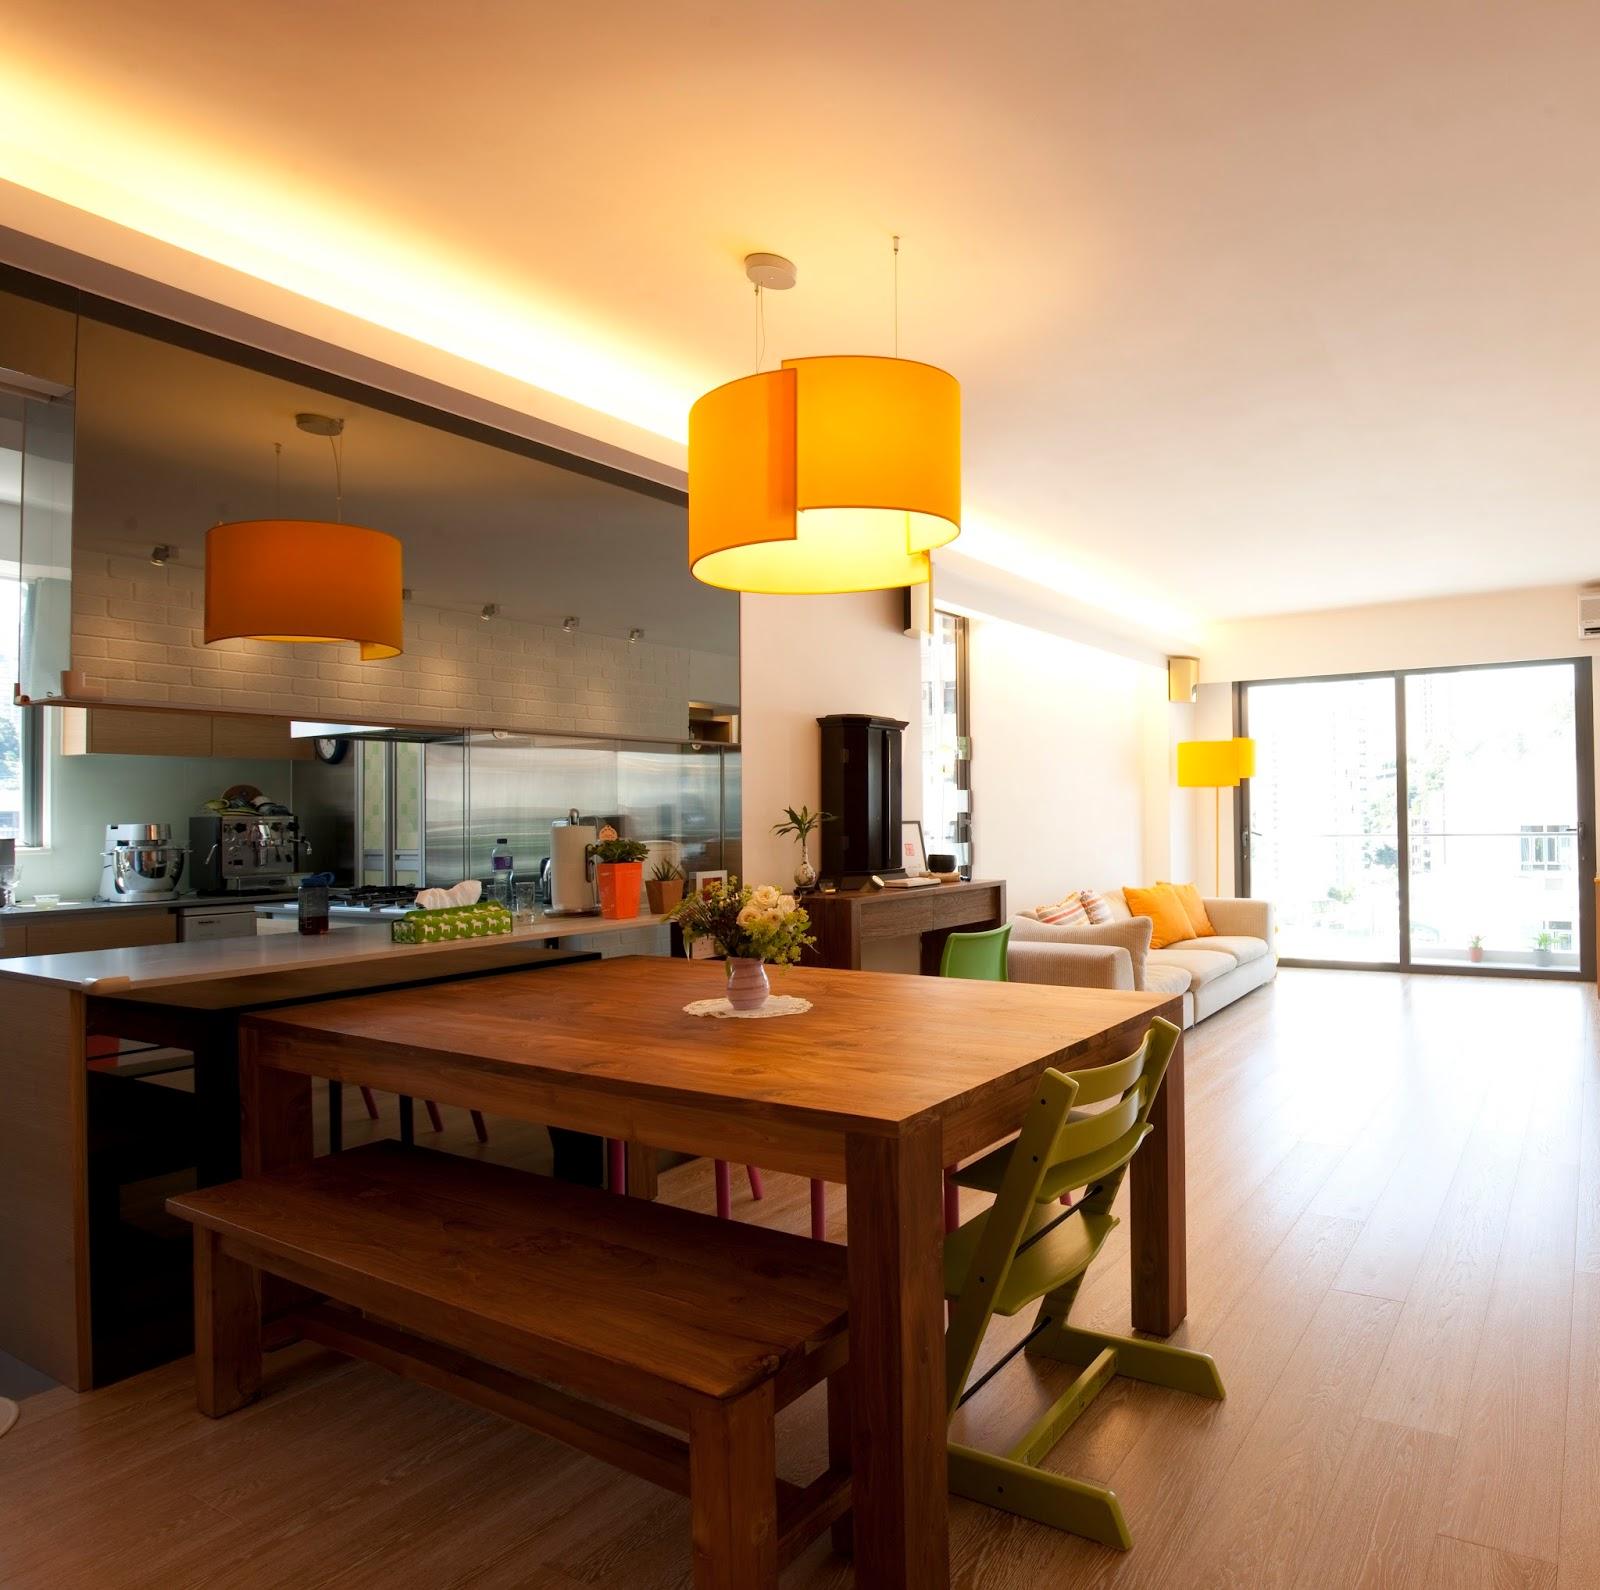 Kitchen Design Hong Kong: Hong Kong Interior Design Tips & Ideas